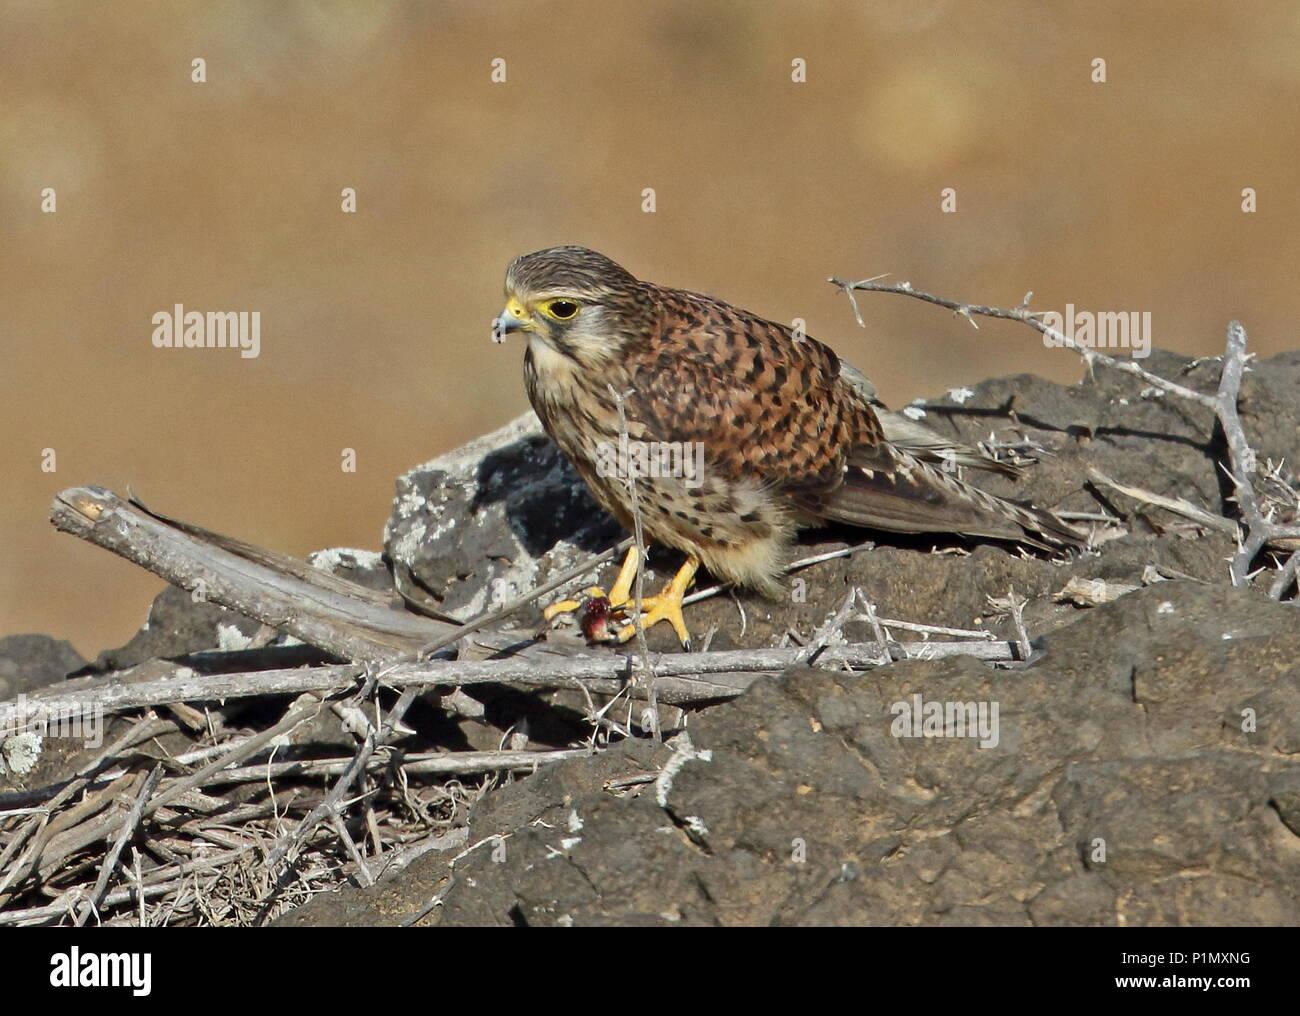 Common Kestrel (Falco tinnunculus alexandri) adult female on rocky mound with lizard prey  Santiago Island, Cape Verde                   April - Stock Image